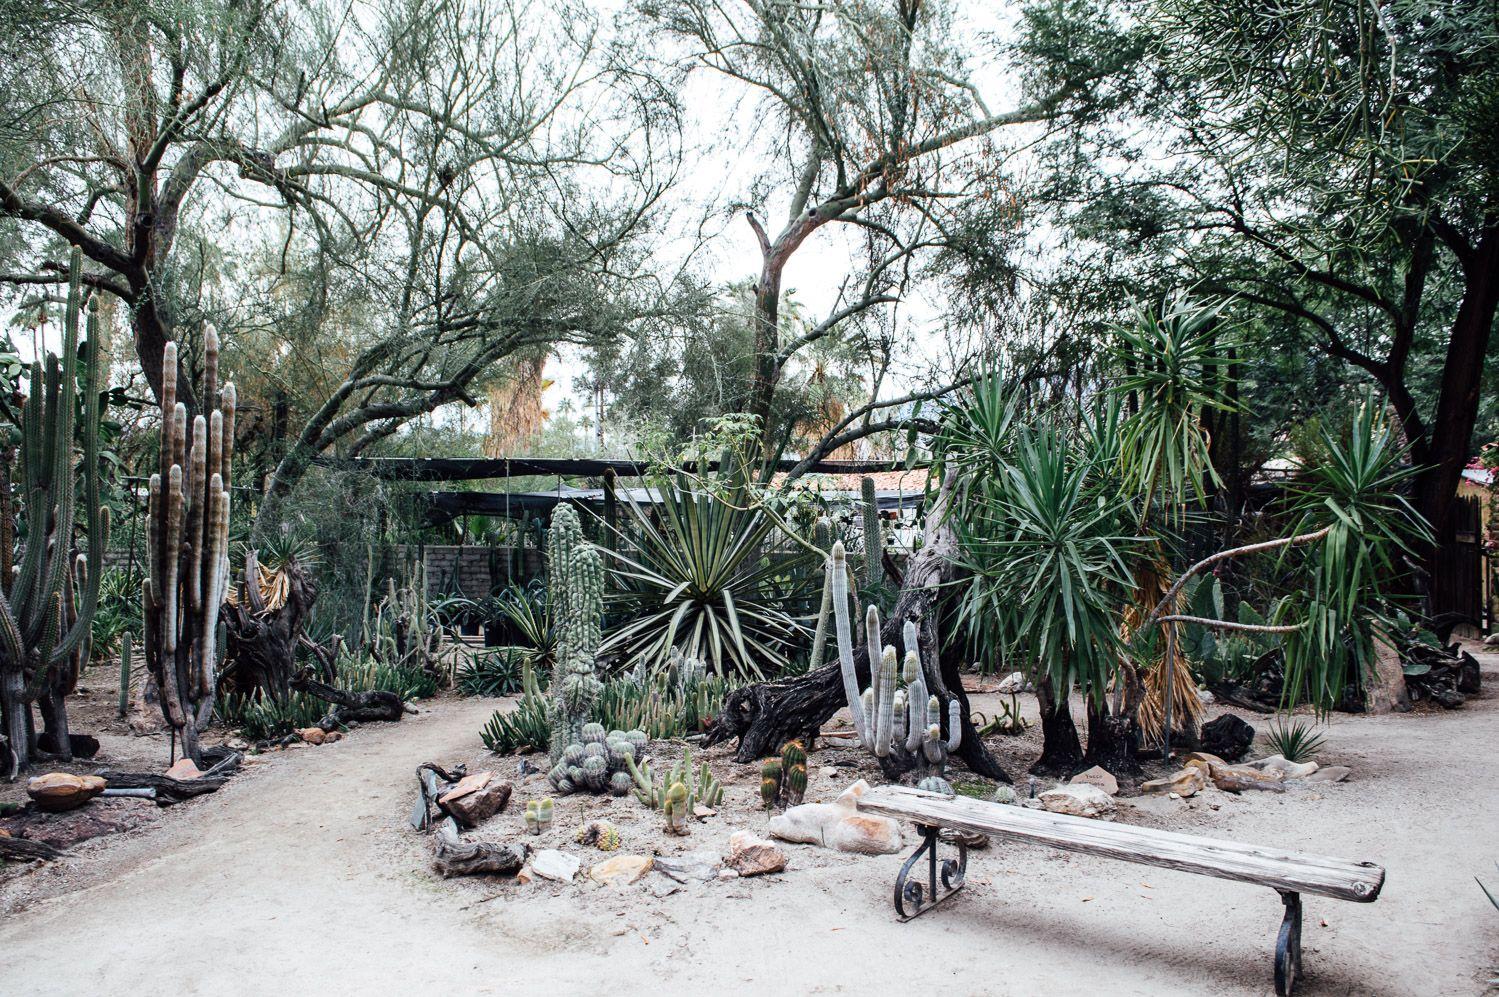 Charmant Moorten Botanical Gardens Palm Springs California Weekend 20 (1499×997)  | December | Pinterest | Gardens, Spring Garden And Spring